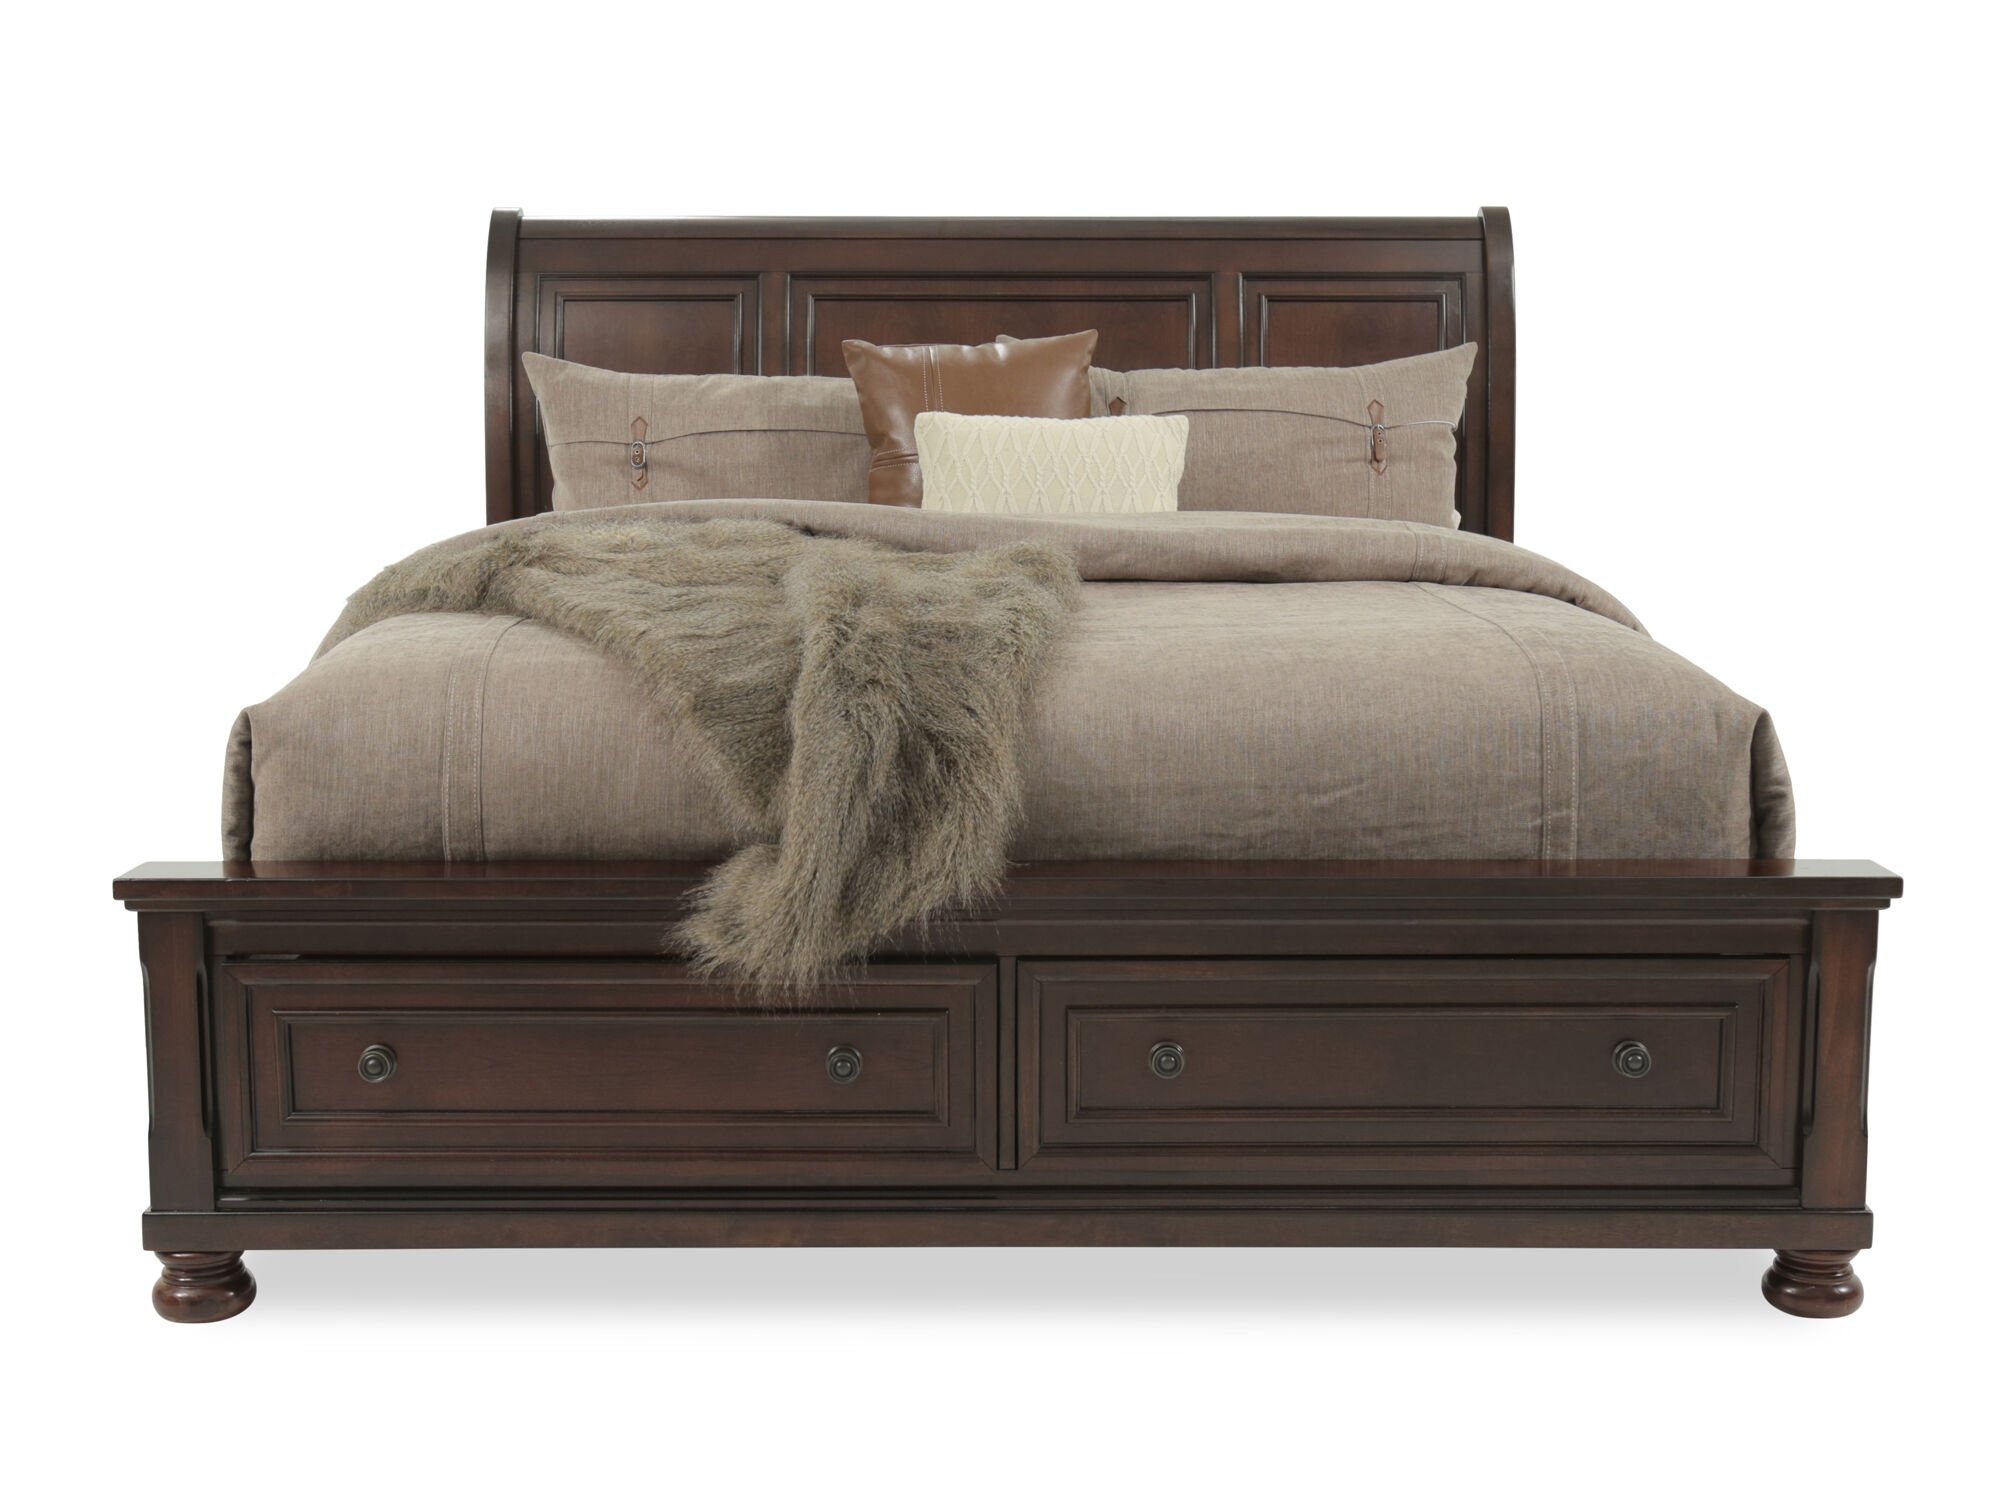 57u0026quot vintage beveled storage casual sleigh bed in rustic brown